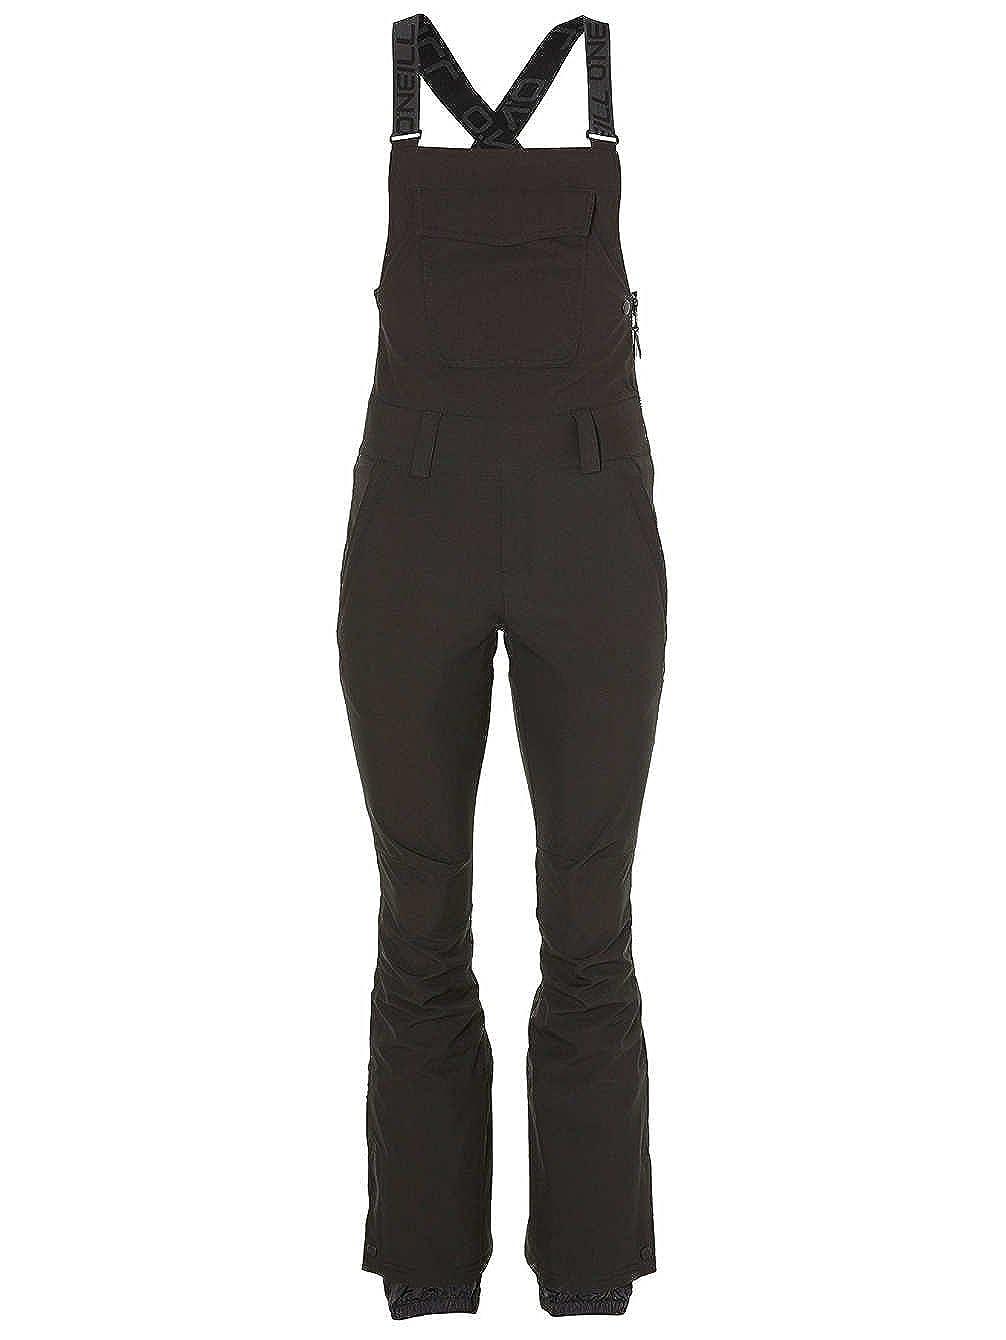 schwarz out L O'Neill Damen Snowboard Hose Shrot Bib Pants